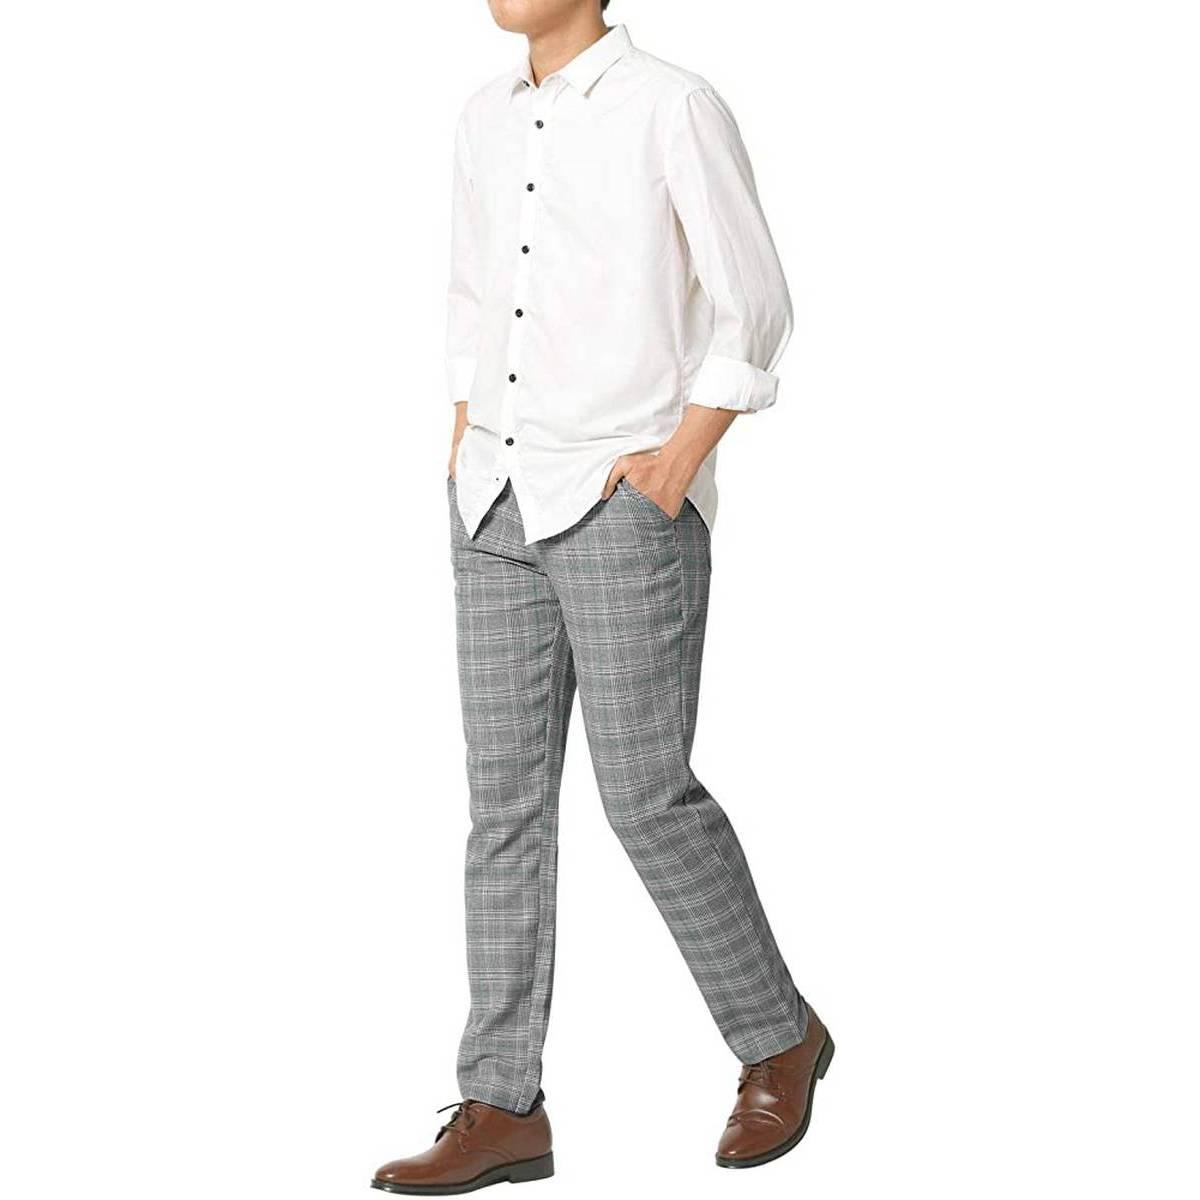 Men's Check Slim Fit Skinny Chino Pants Grey Super Stretch Pant